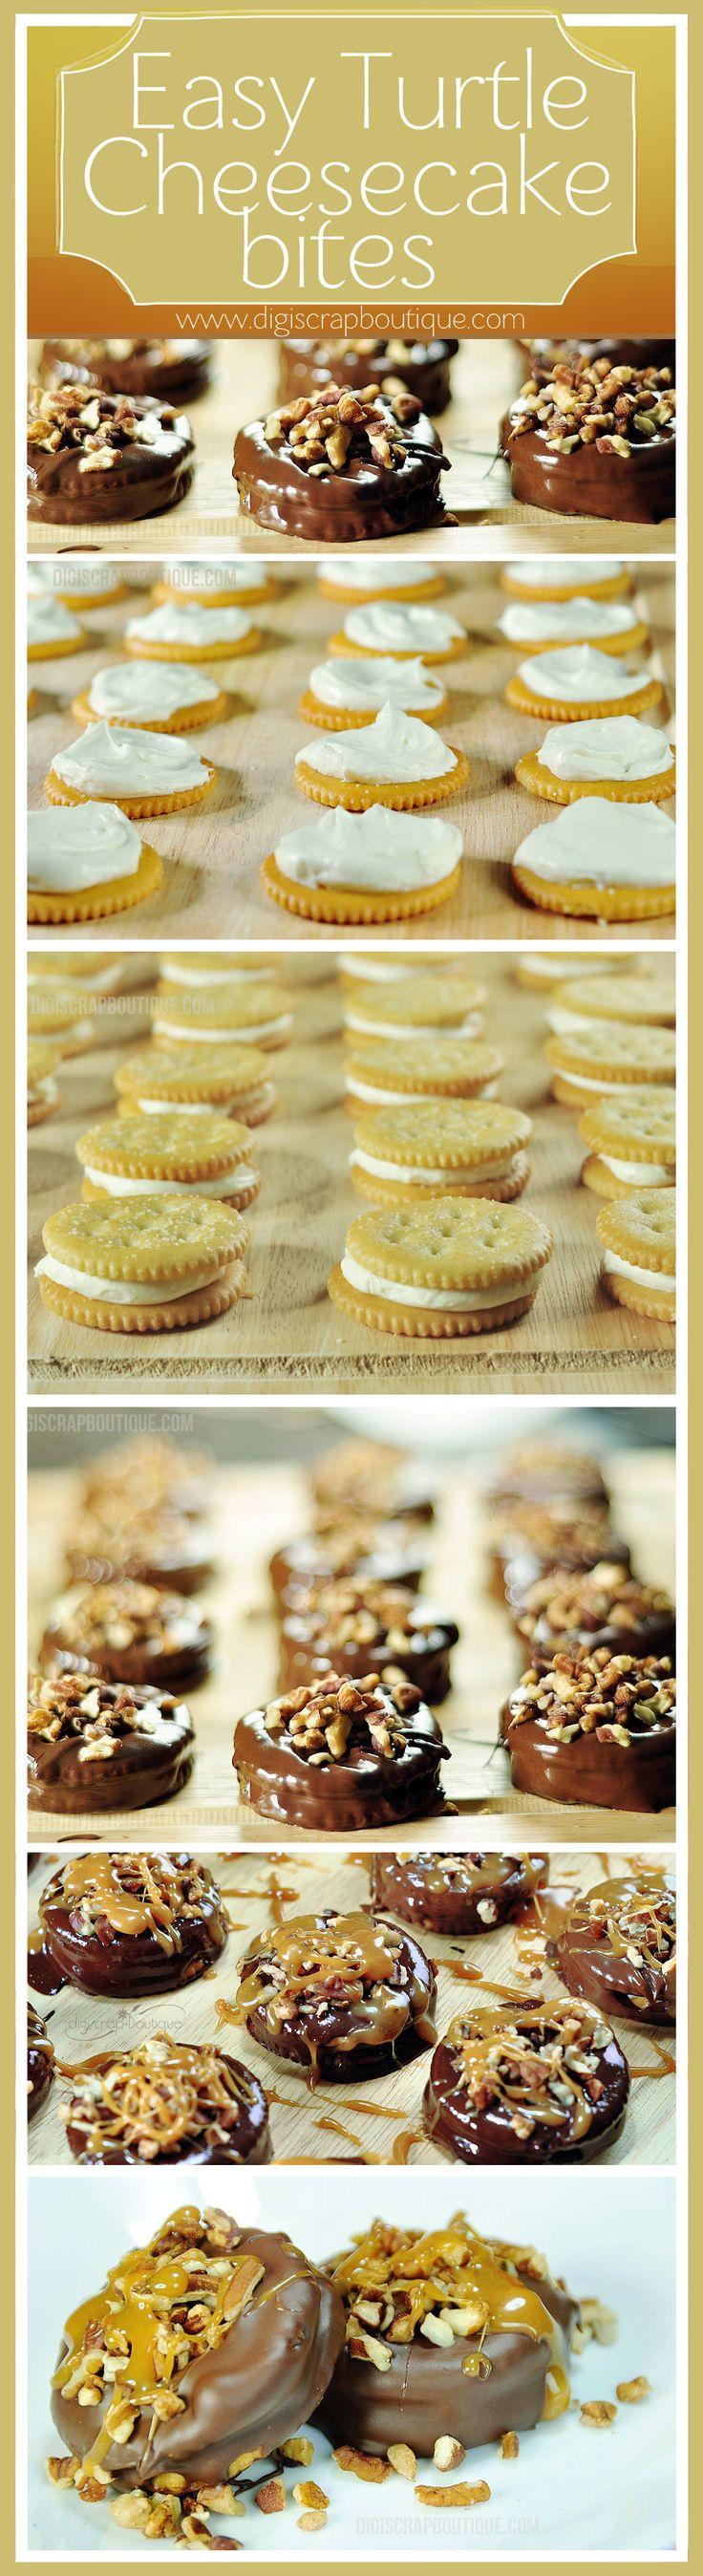 Easy Cheesecake Recipe: Easy Chocolate Covered Turtle Cheesecake Bites To Be Exact